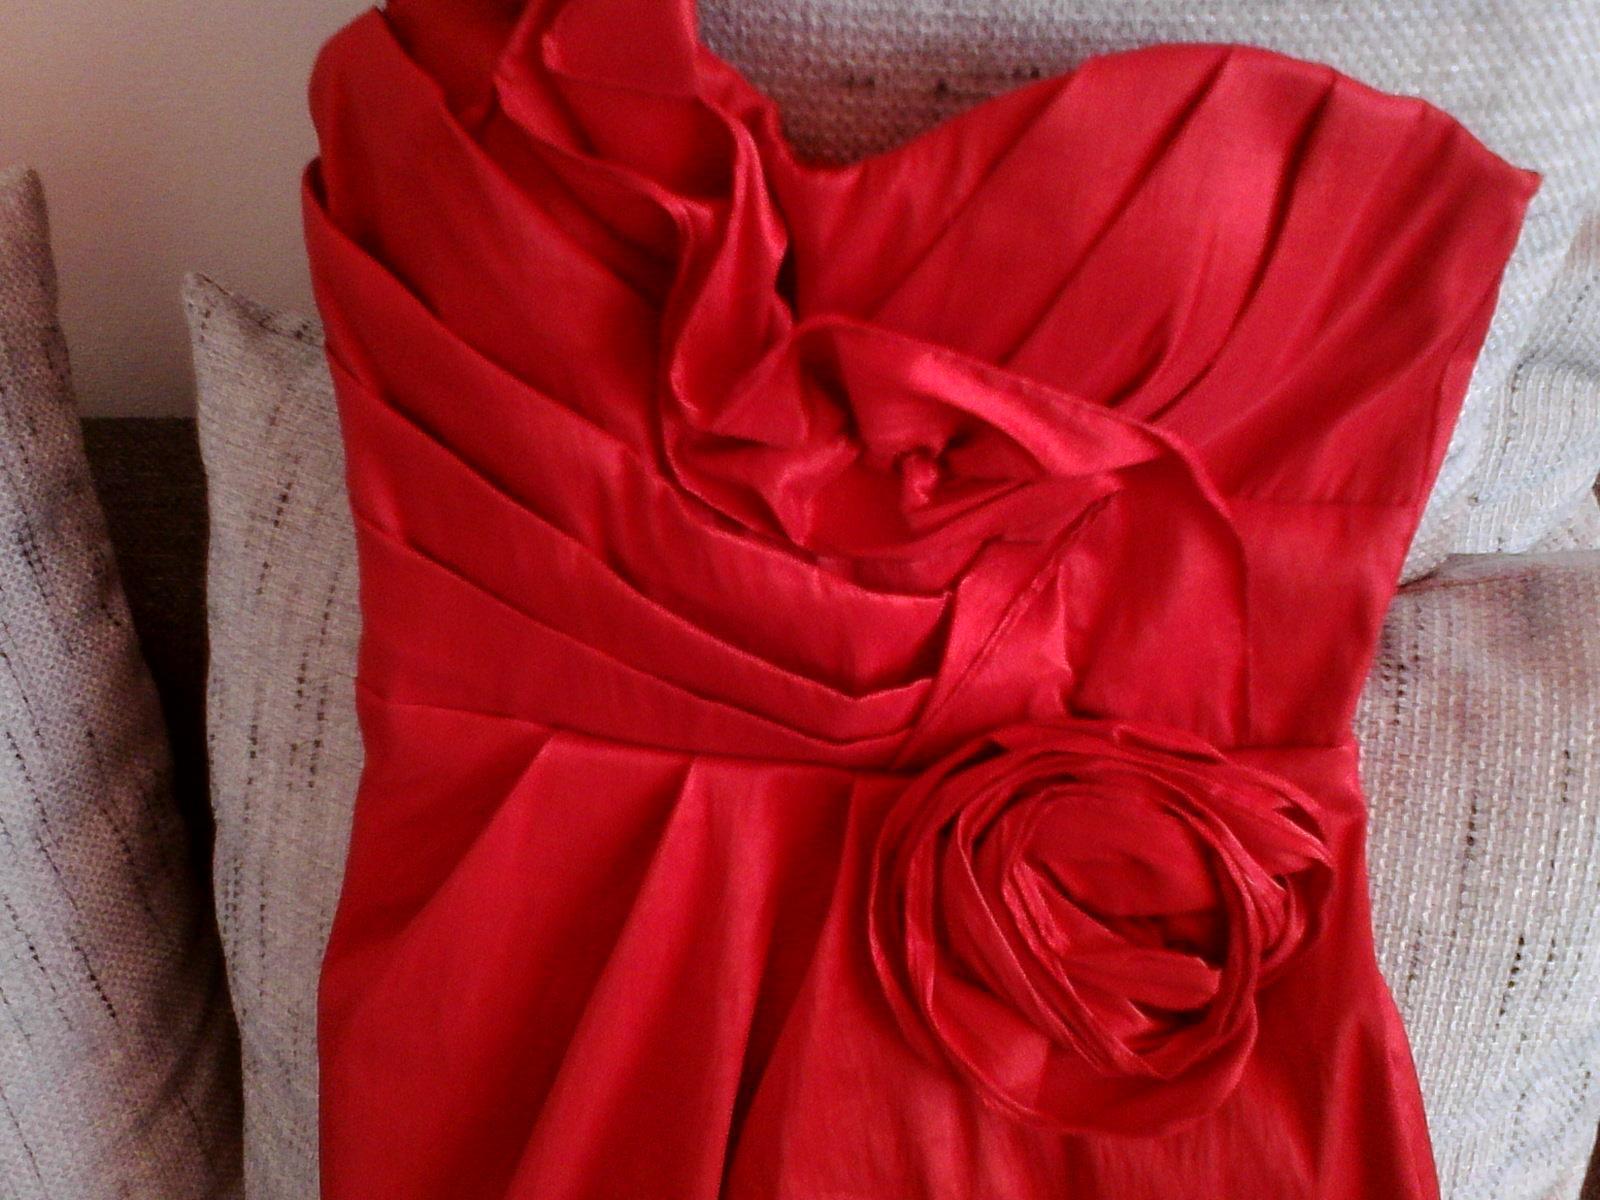 Luxusné šaty zn. MIŠO - Obrázok č. 1